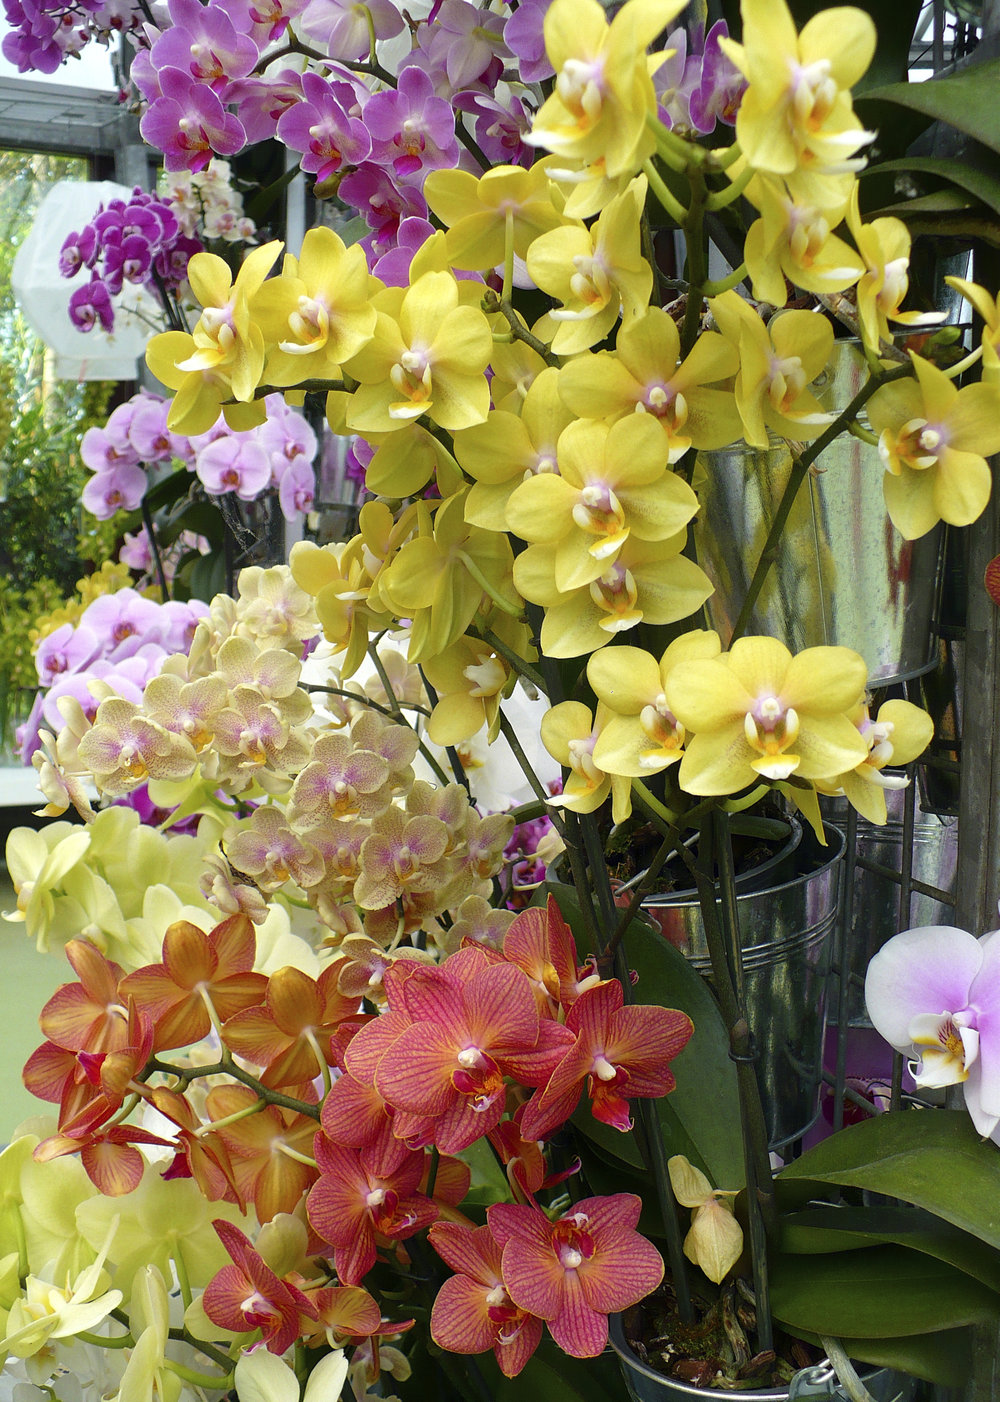 maui-wholesale-blooms-412.jpg